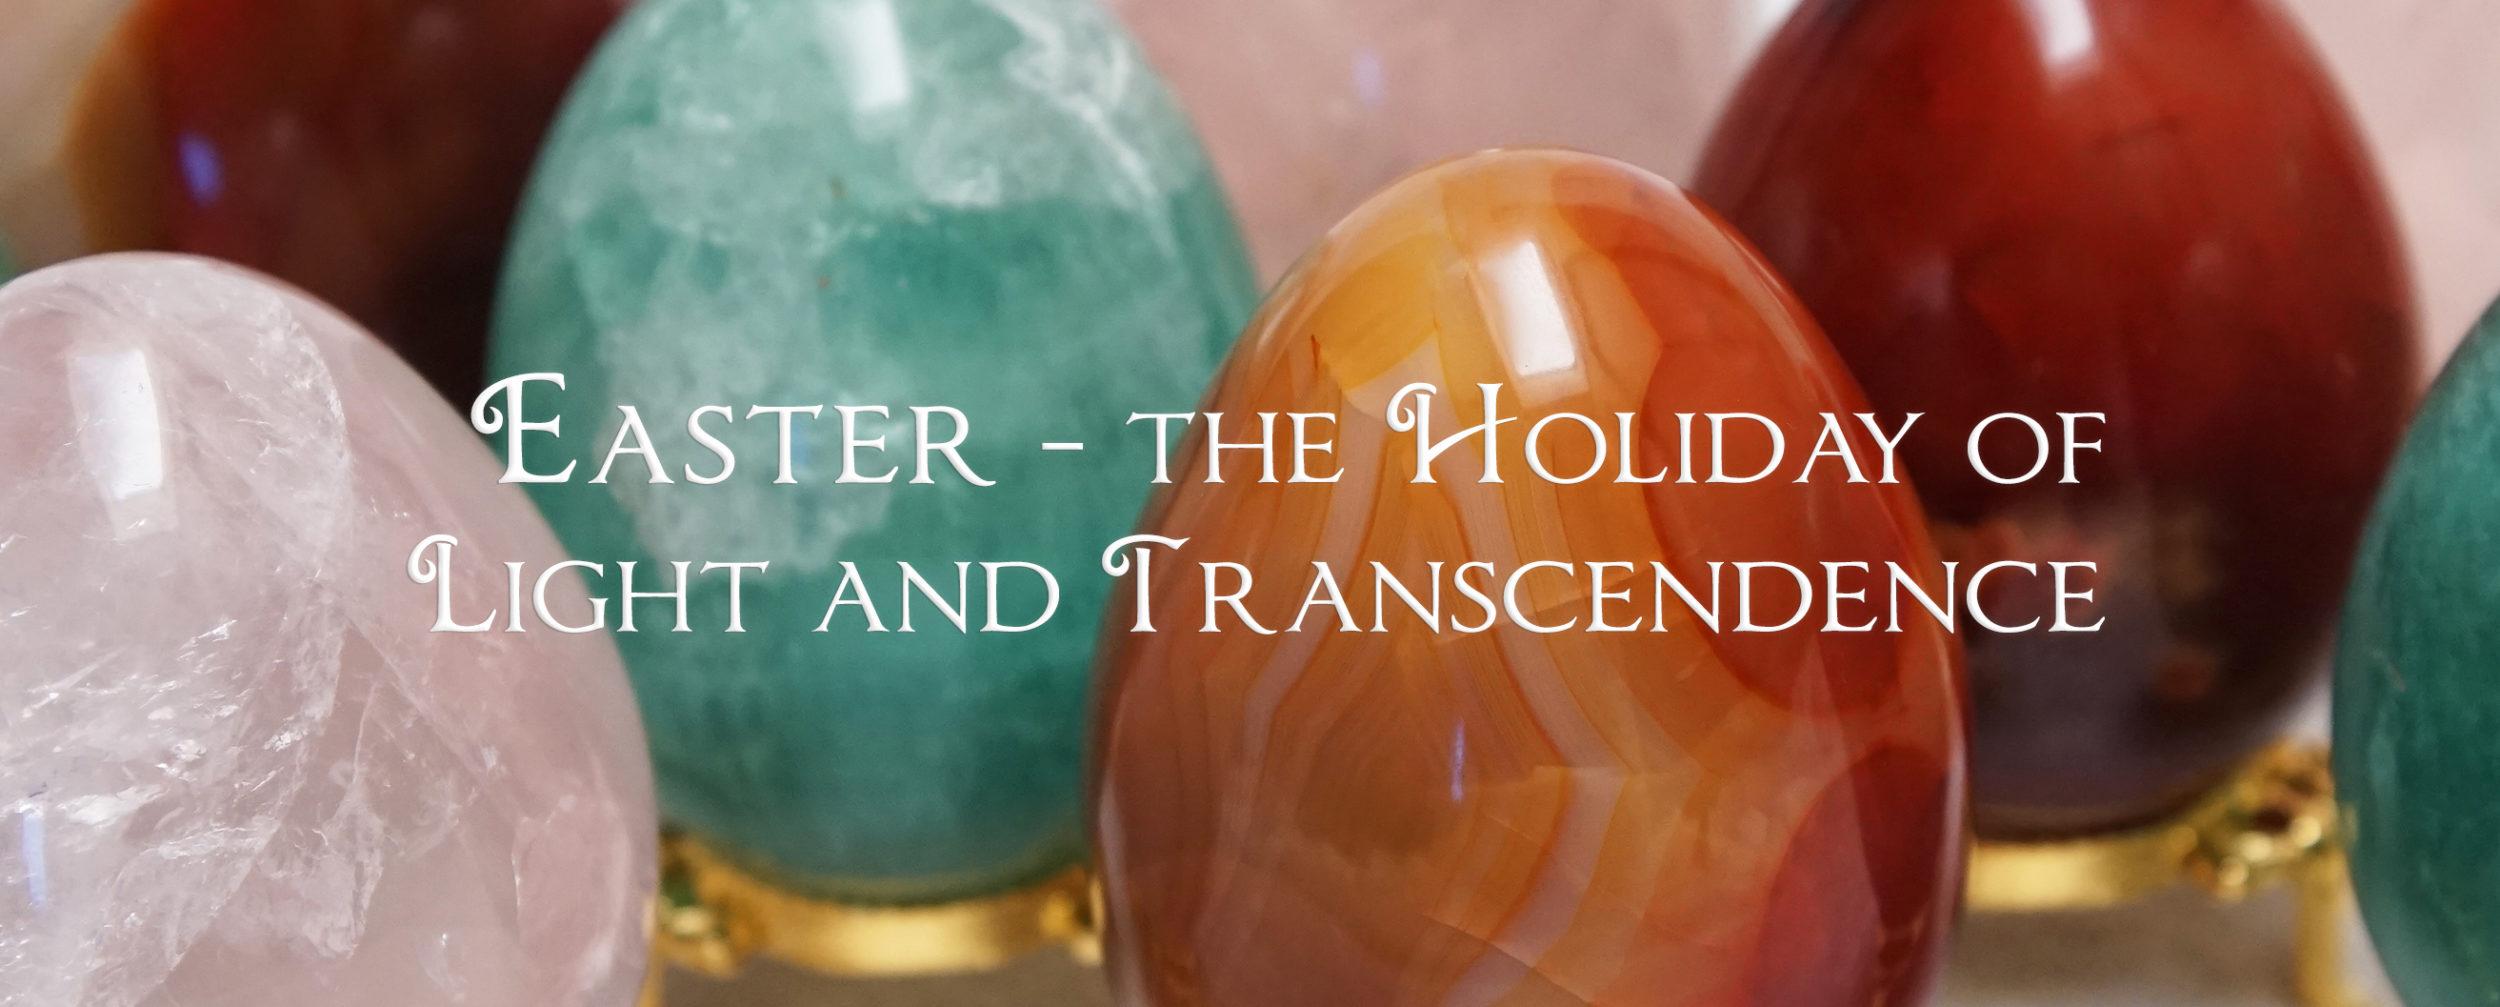 Easterbannerblog